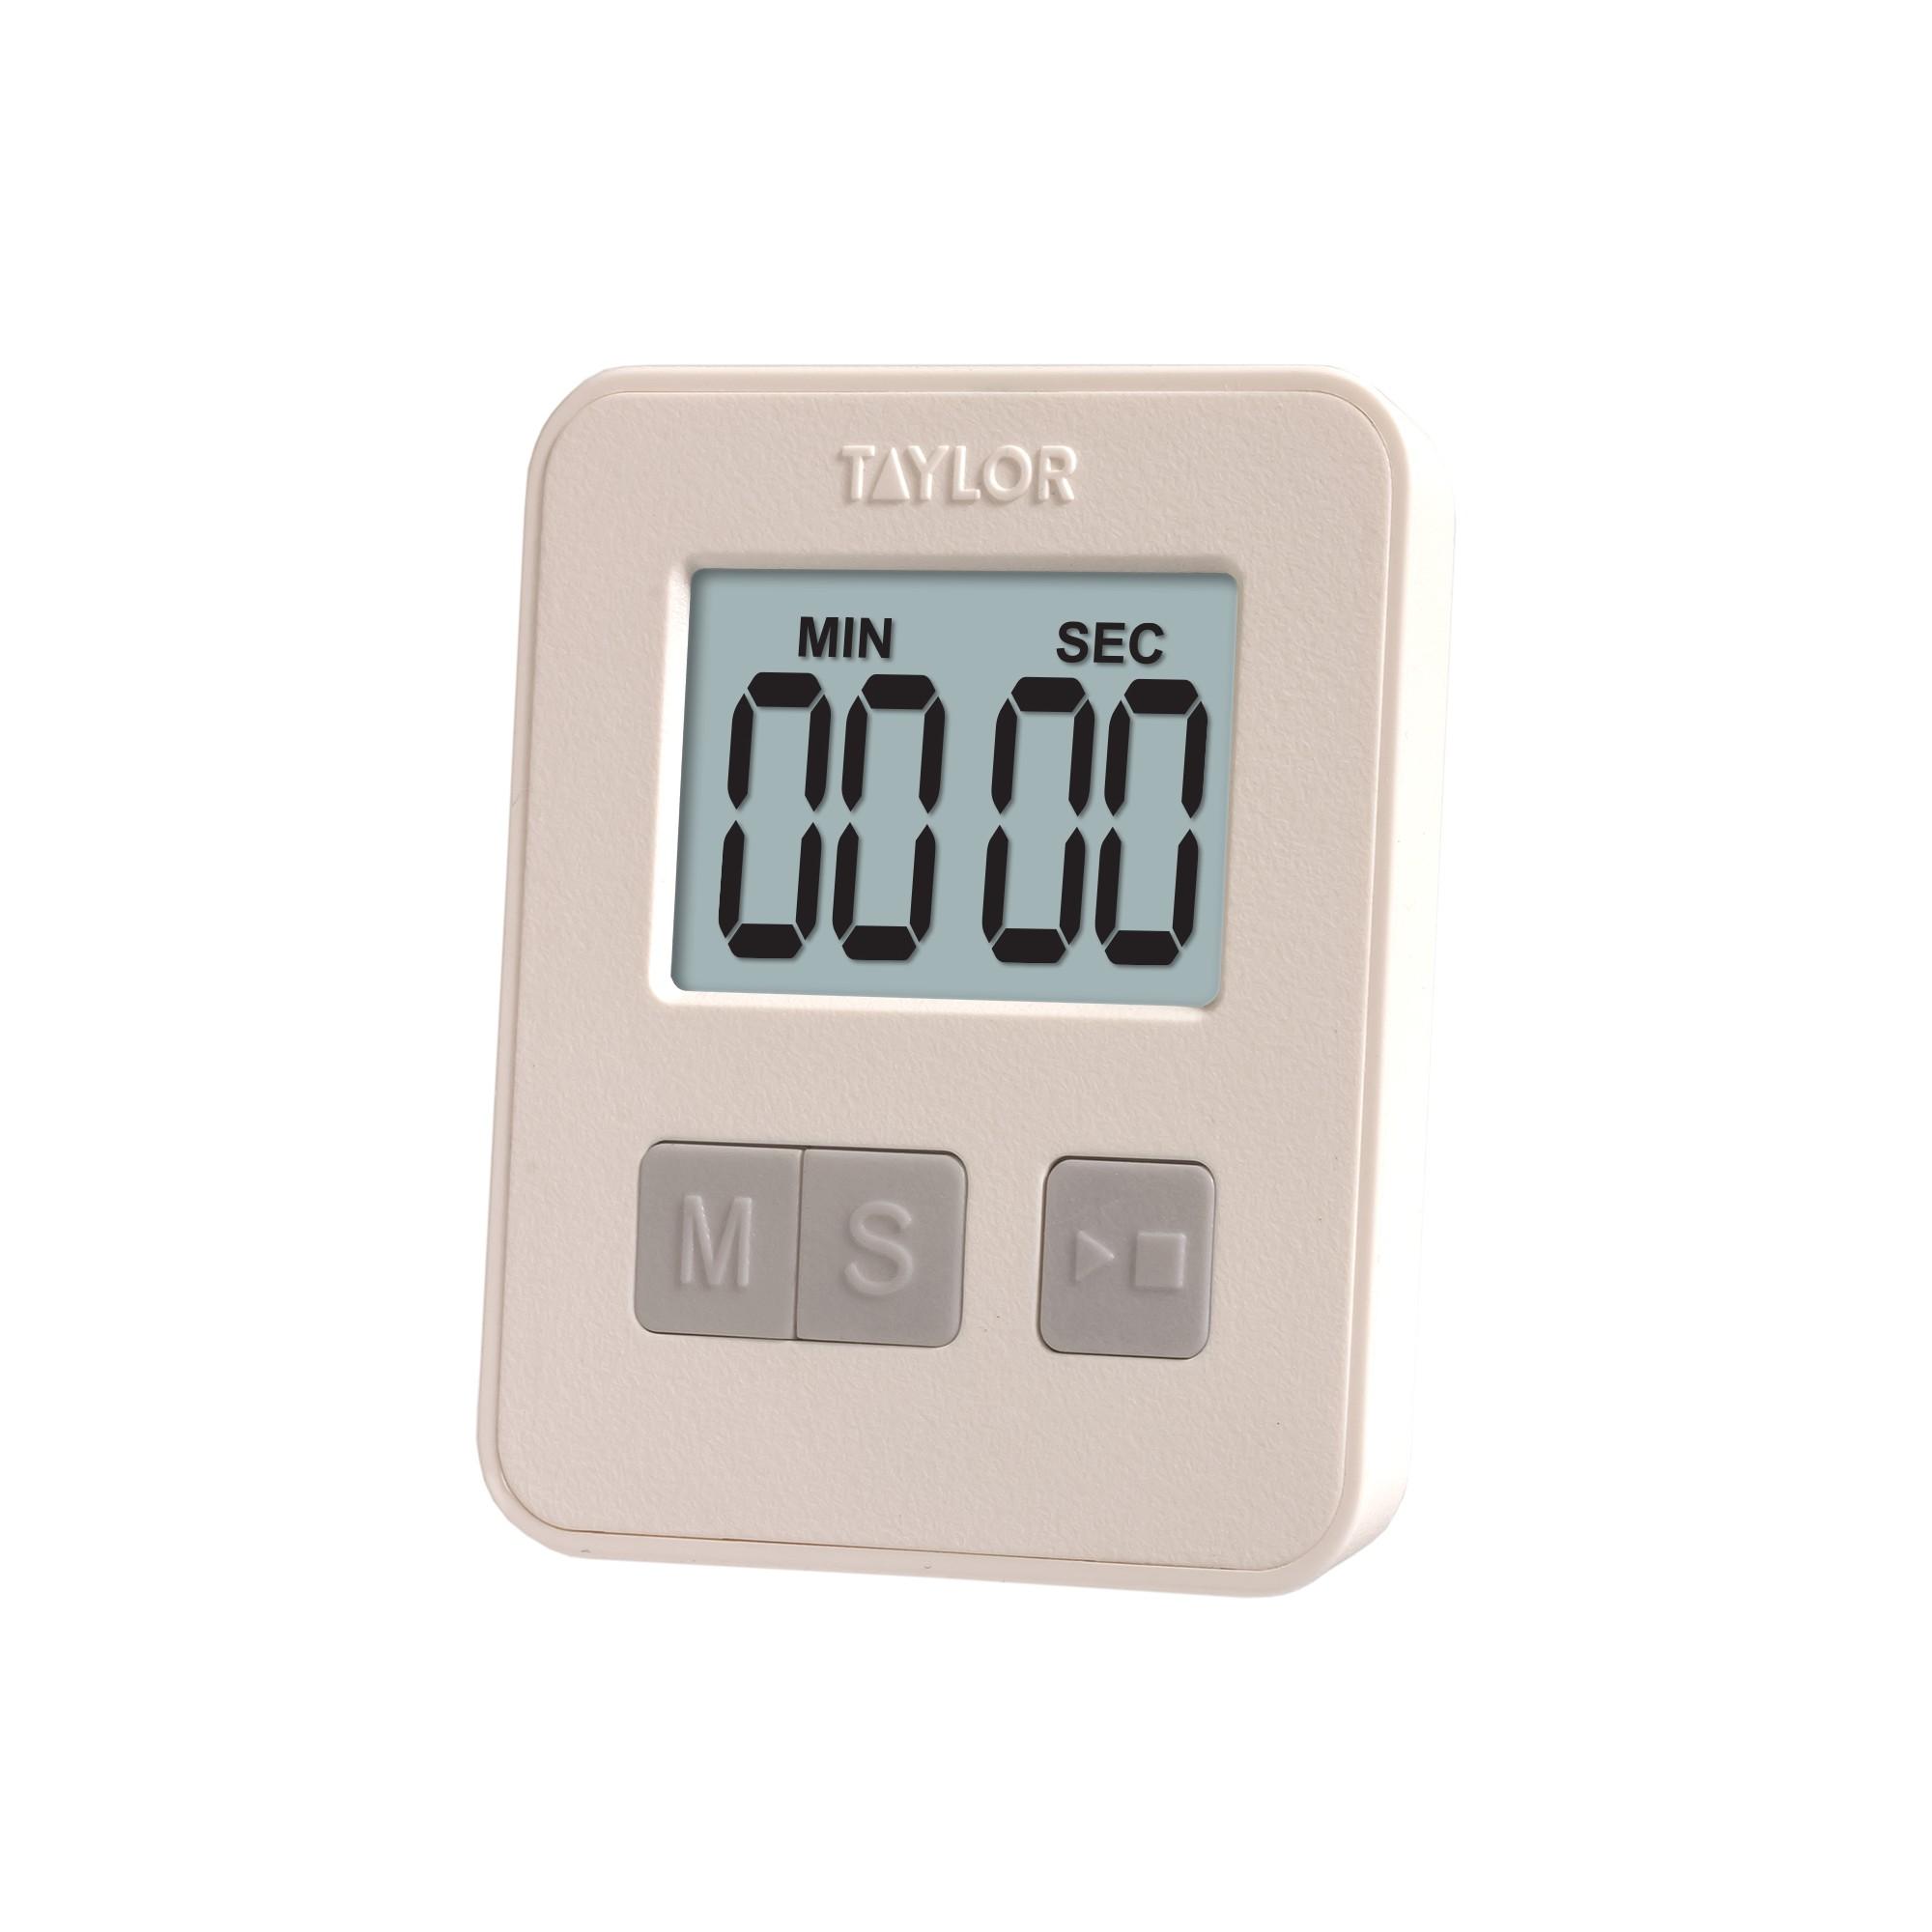 Taylor 99 Minute Slim Digital Timer, White